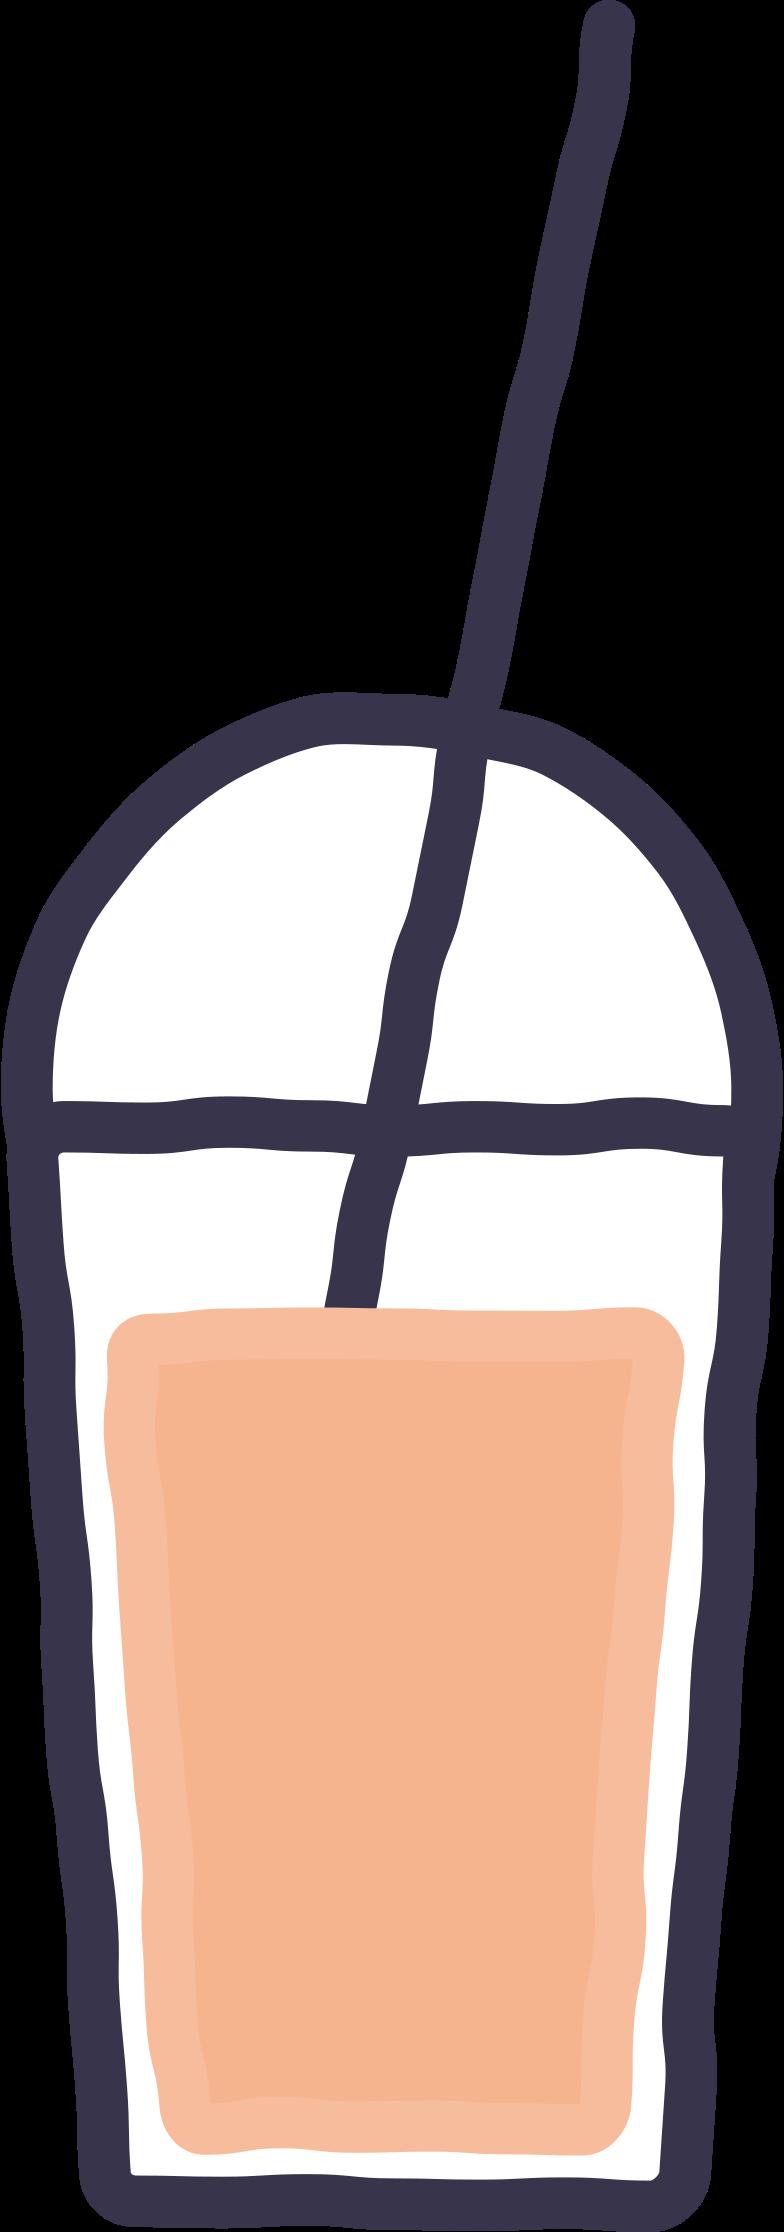 milkshake Clipart illustration in PNG, SVG